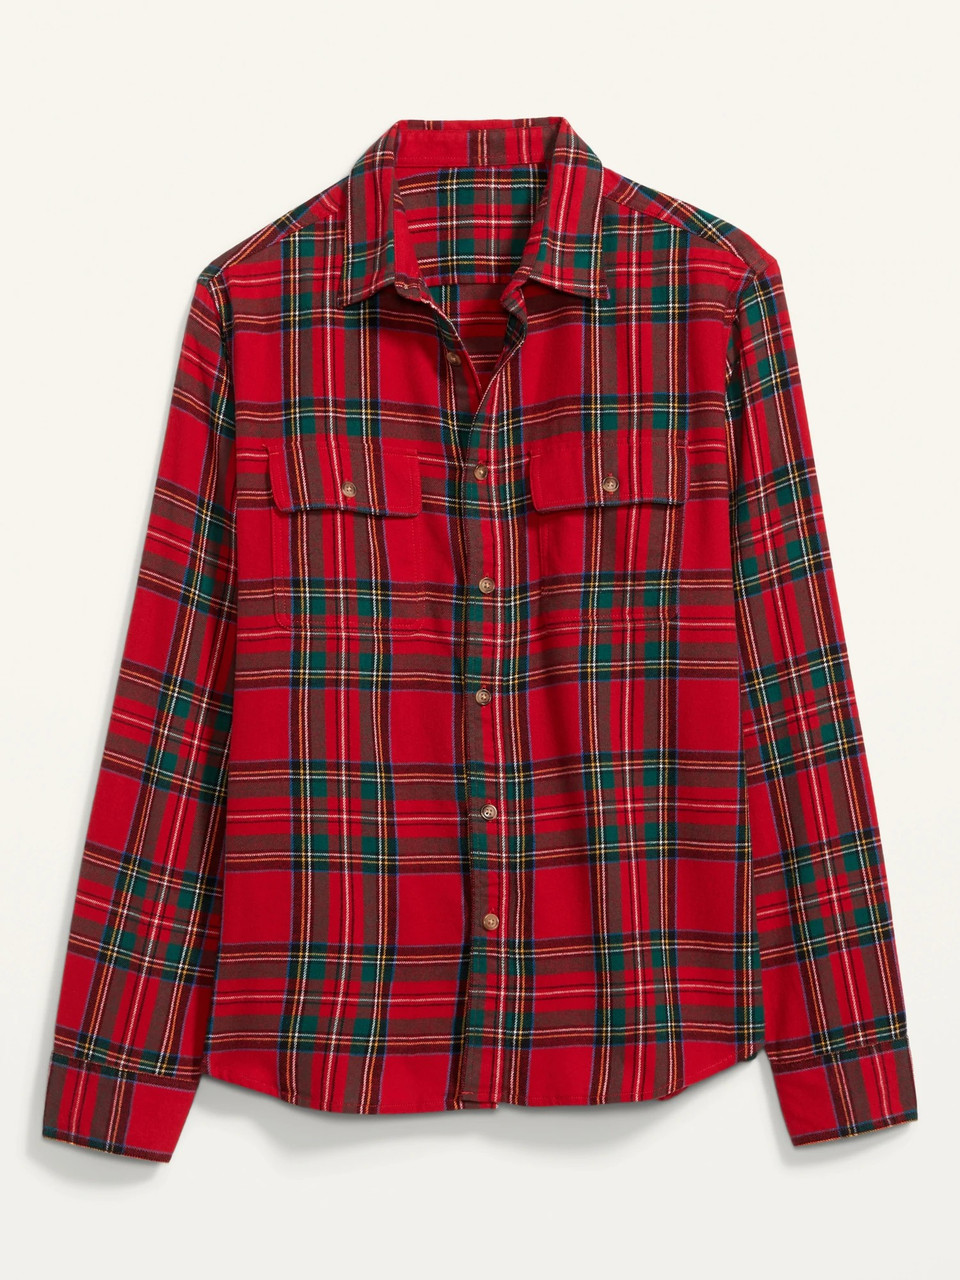 Мужская фланелевая рубашка в клетку Old Navy art764128 (Красный/Зеленый, размер XXXL)